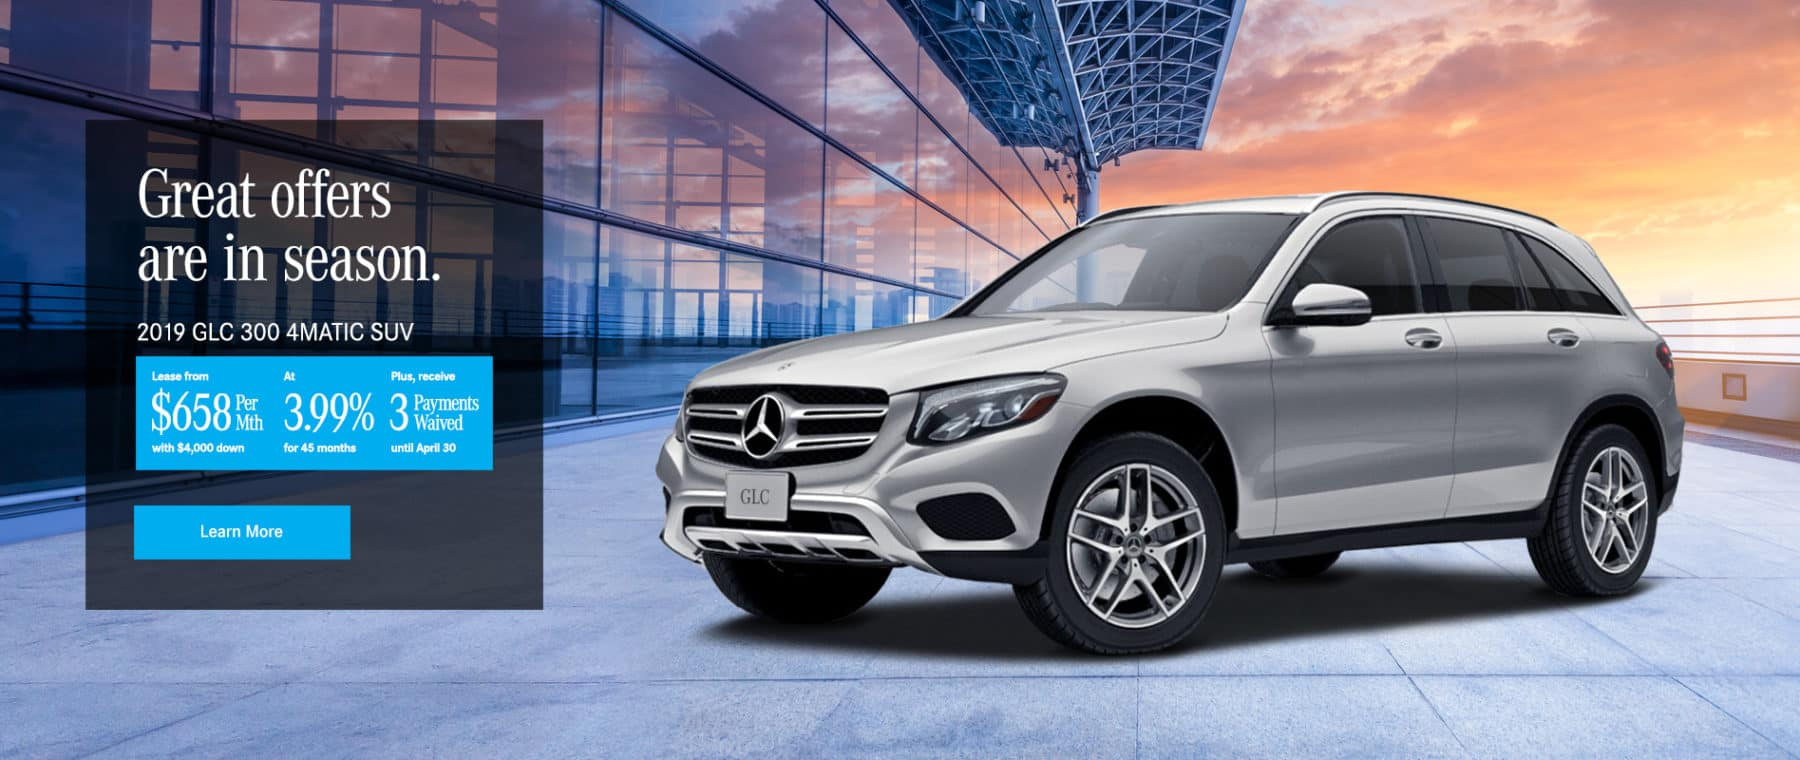 1920x800_HP-SLIDER_04-2019_NC-2019-GLC-300-SUV